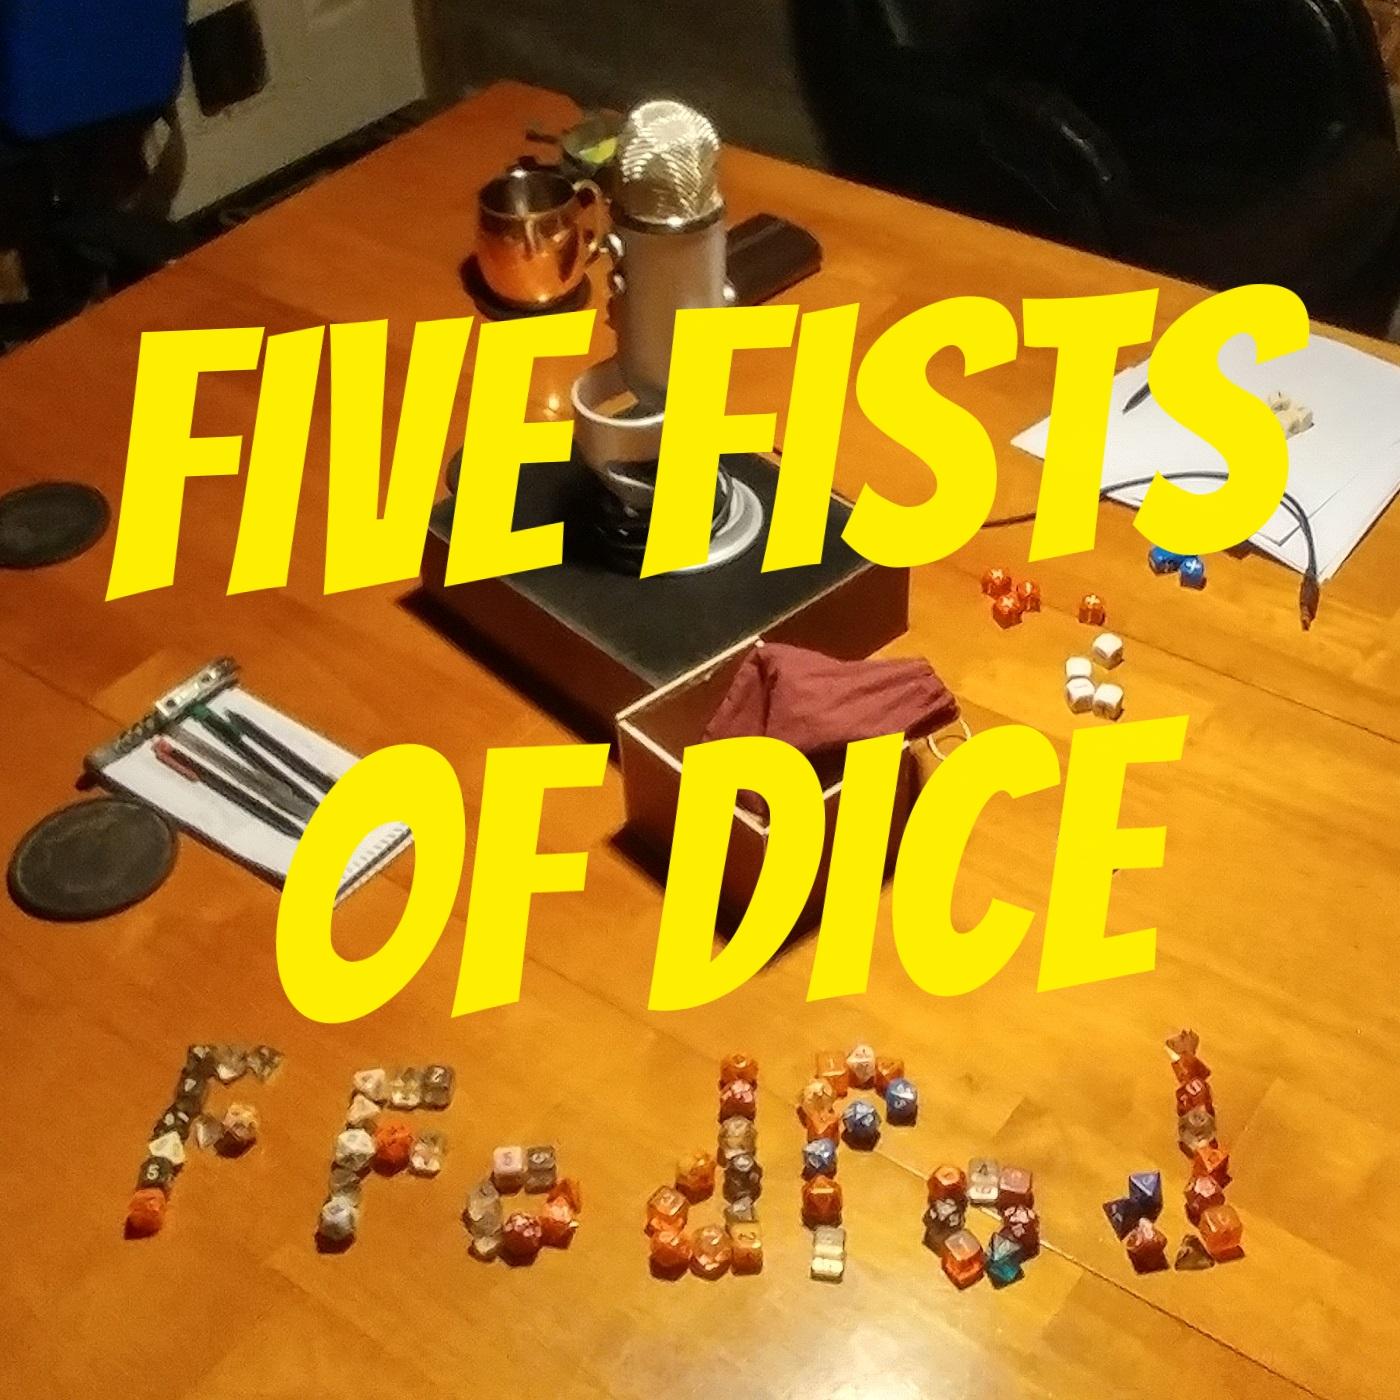 FFoDPod - Five Fists of Dice show art